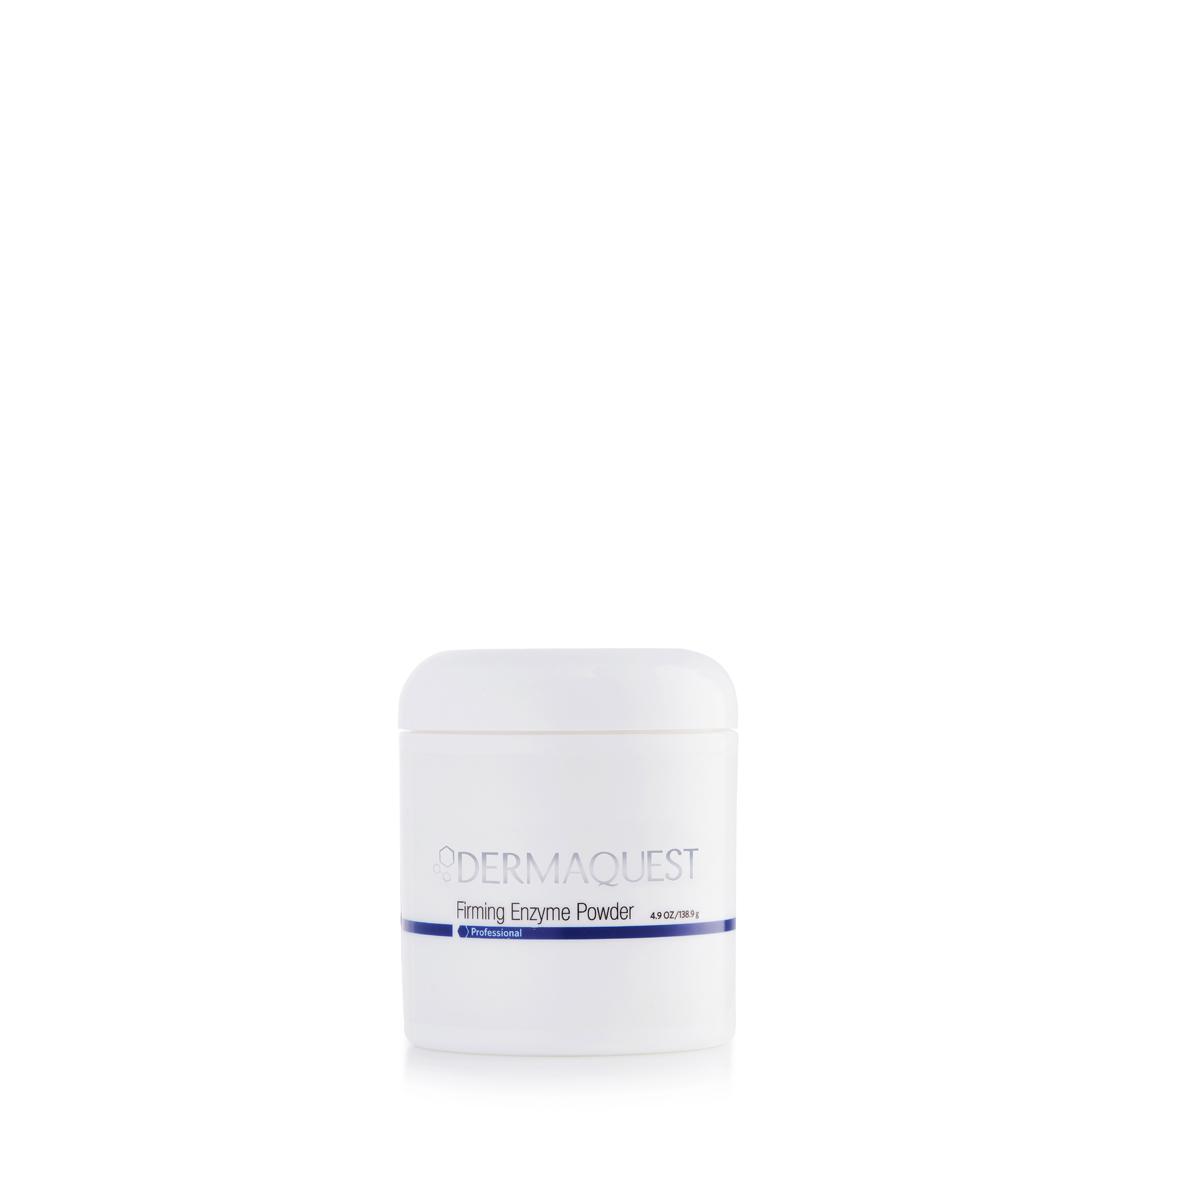 Firming Enzyme Powder – Professional